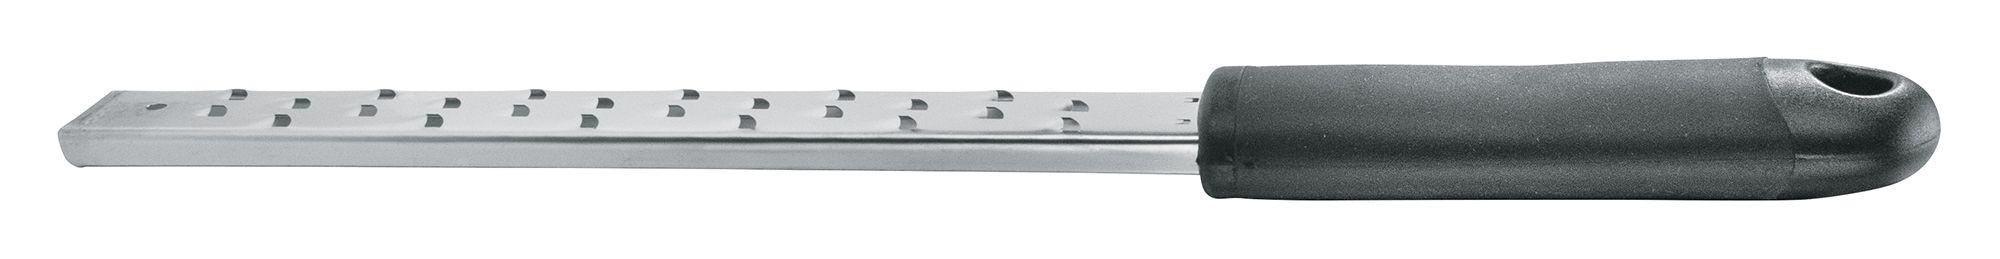 Grater 103 - W/ Medium Coarse Blade